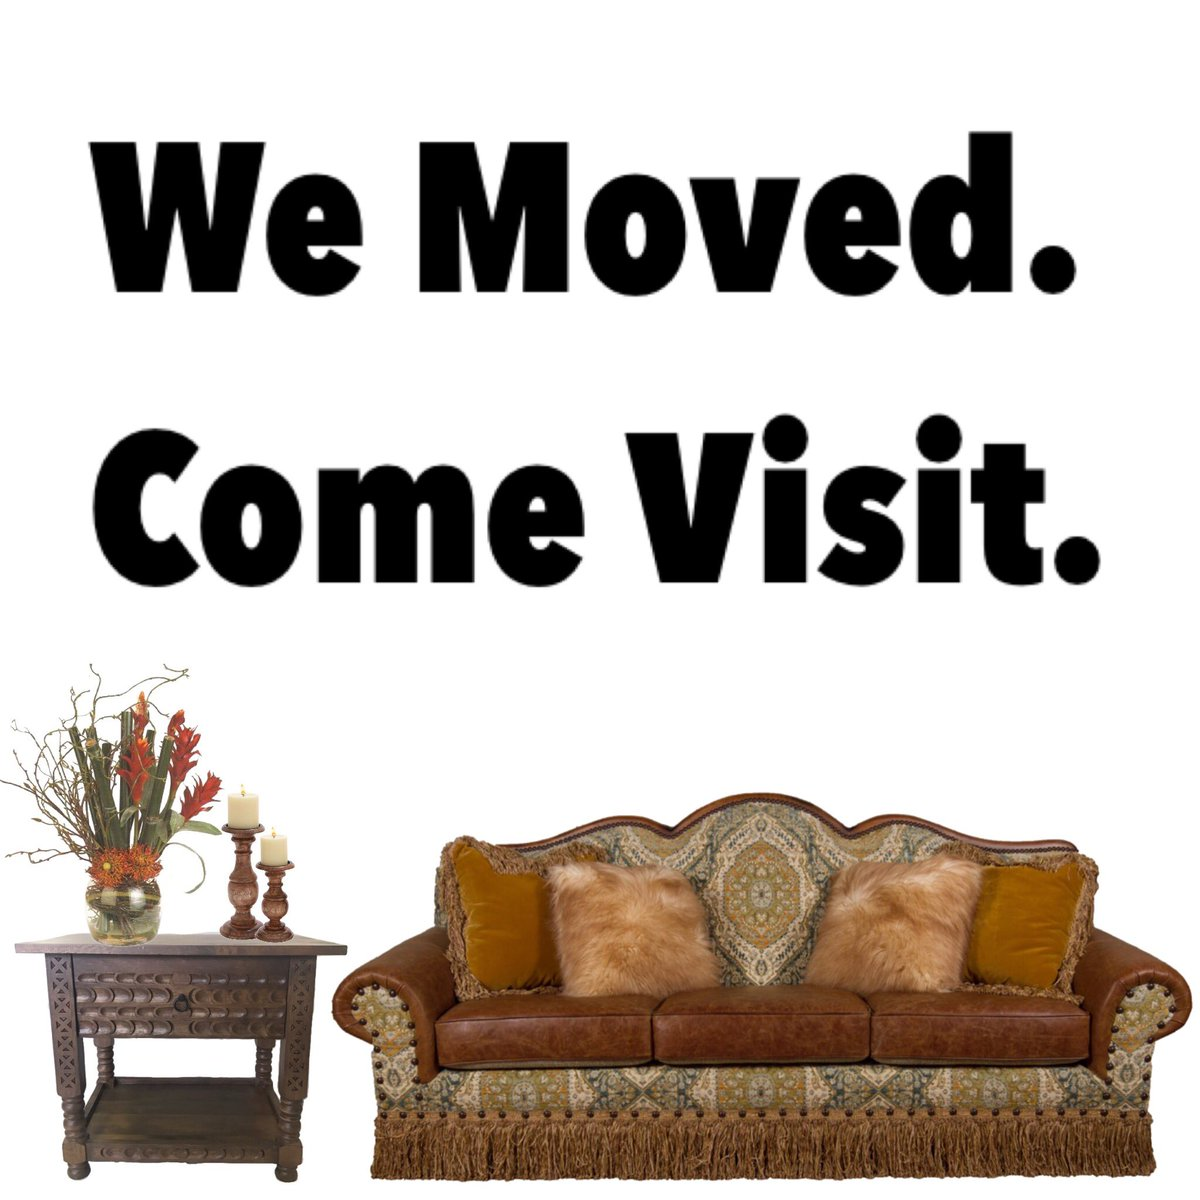 150 Howell St Dallas, TX 75207 214.651.2525  Sales@bellarusticahome.compic.twitter.com/OAH5615Th5 · Bella Rustica And  DallasDesignDistrict